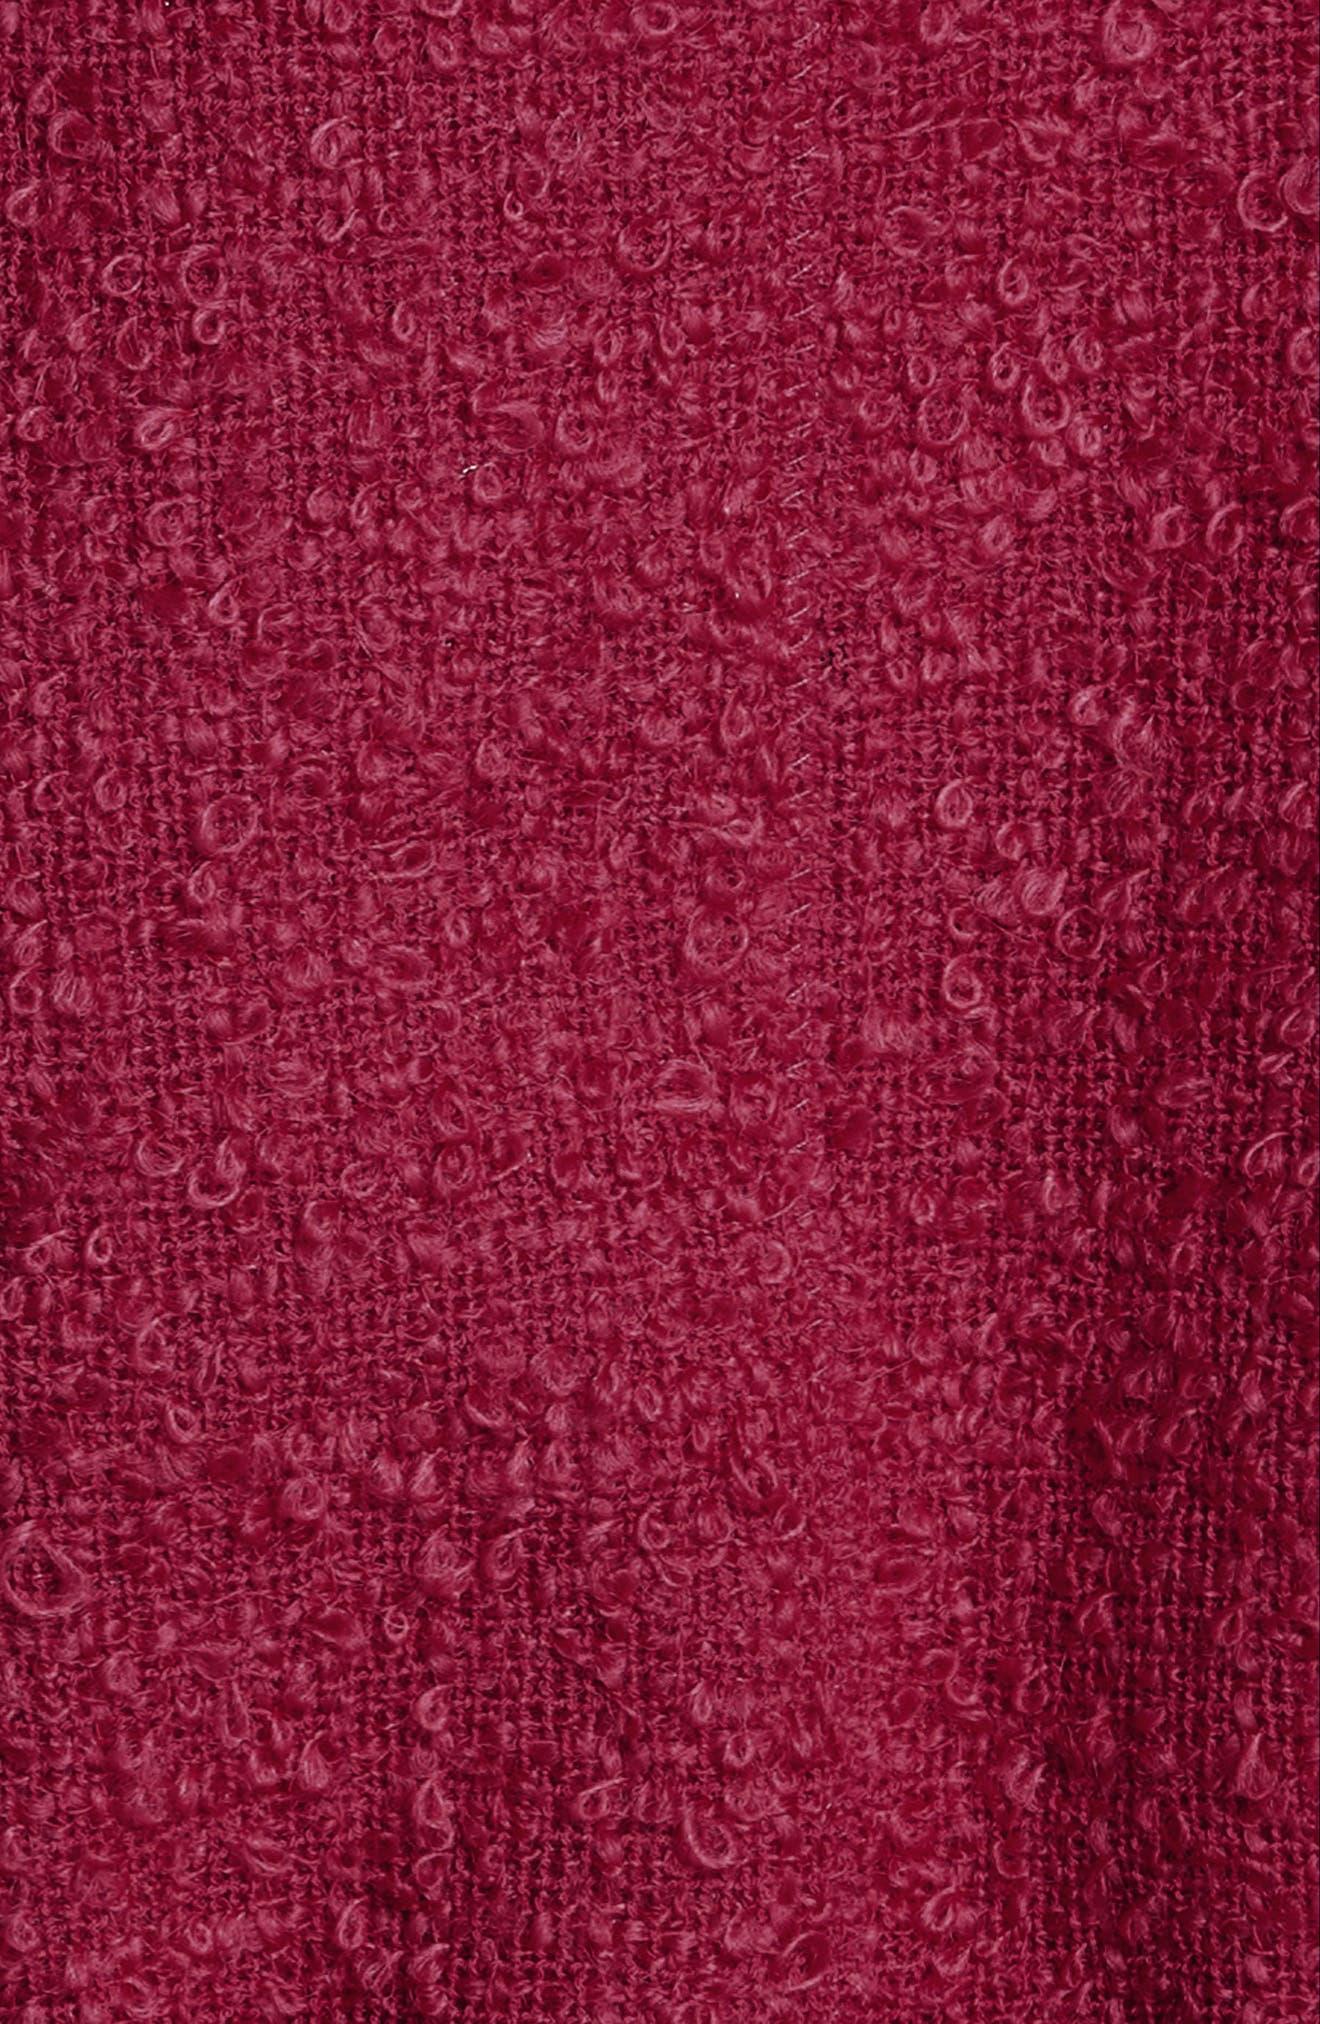 Flare Hem Tweed Skirt,                             Alternate thumbnail 5, color,                             607